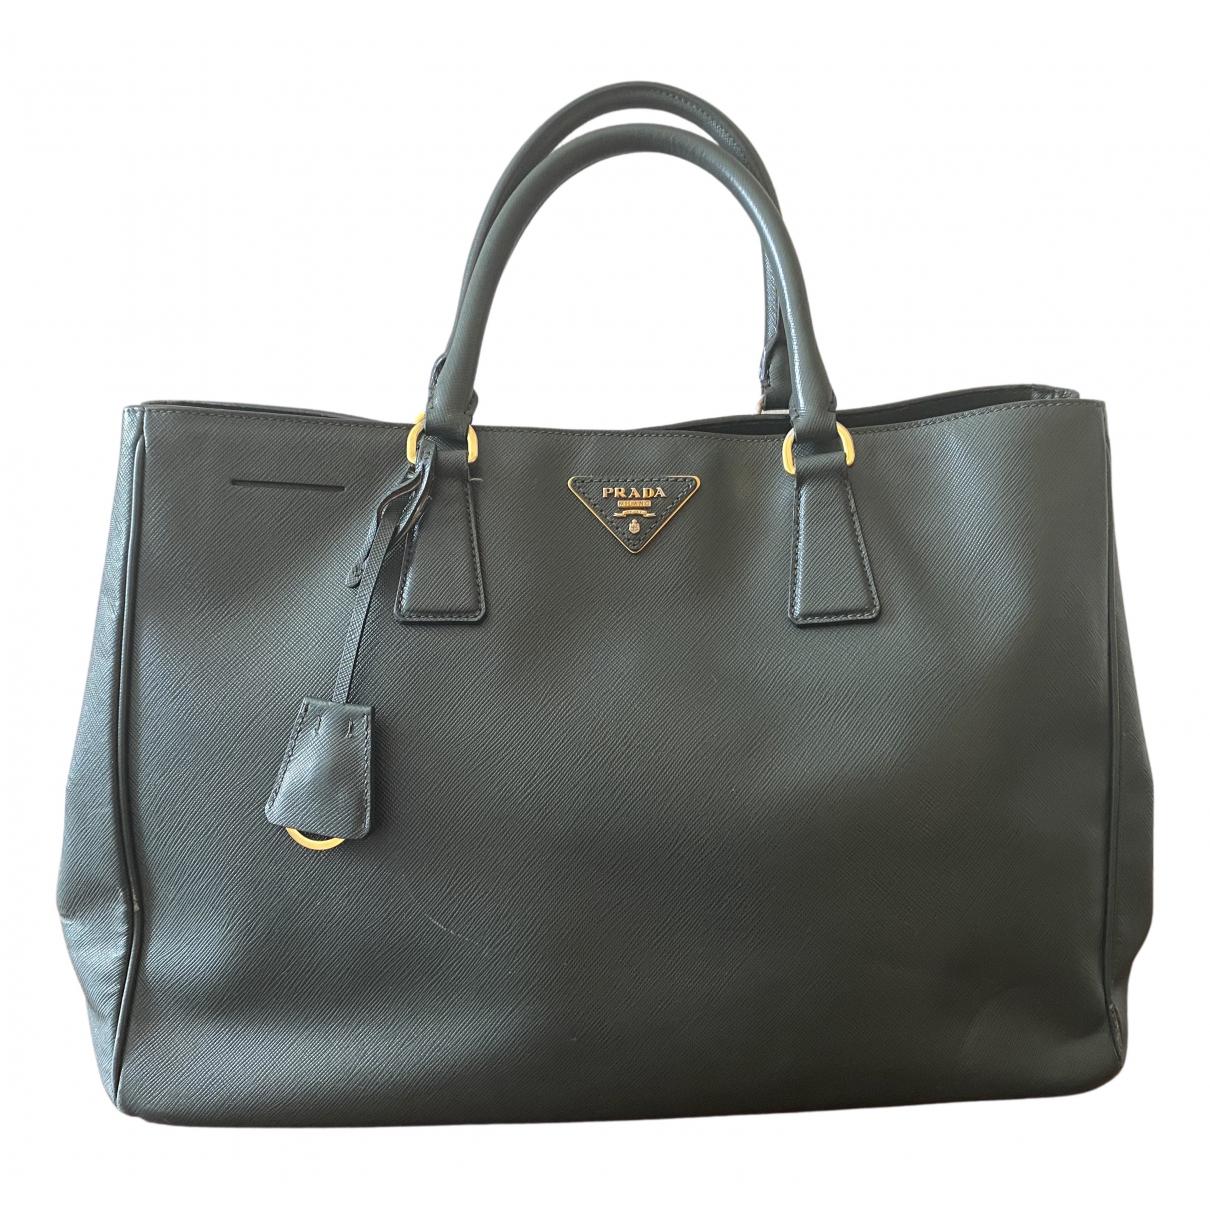 Prada saffiano  Green Leather handbag for Women N